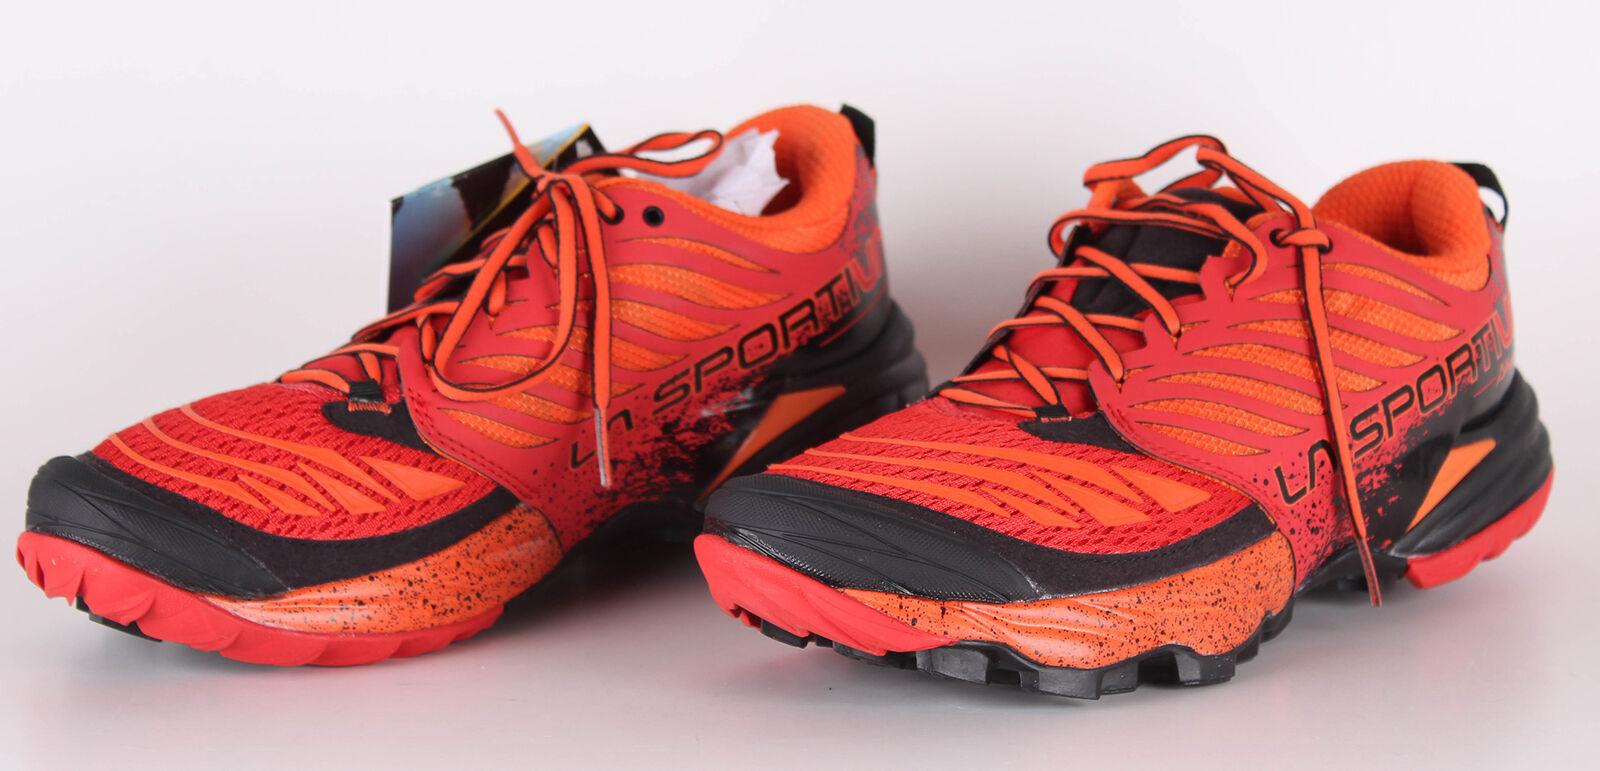 La Sportiva Akasha Herren Sneakers Trailschuhe Laufschuhe Rot (Flame), 41.5